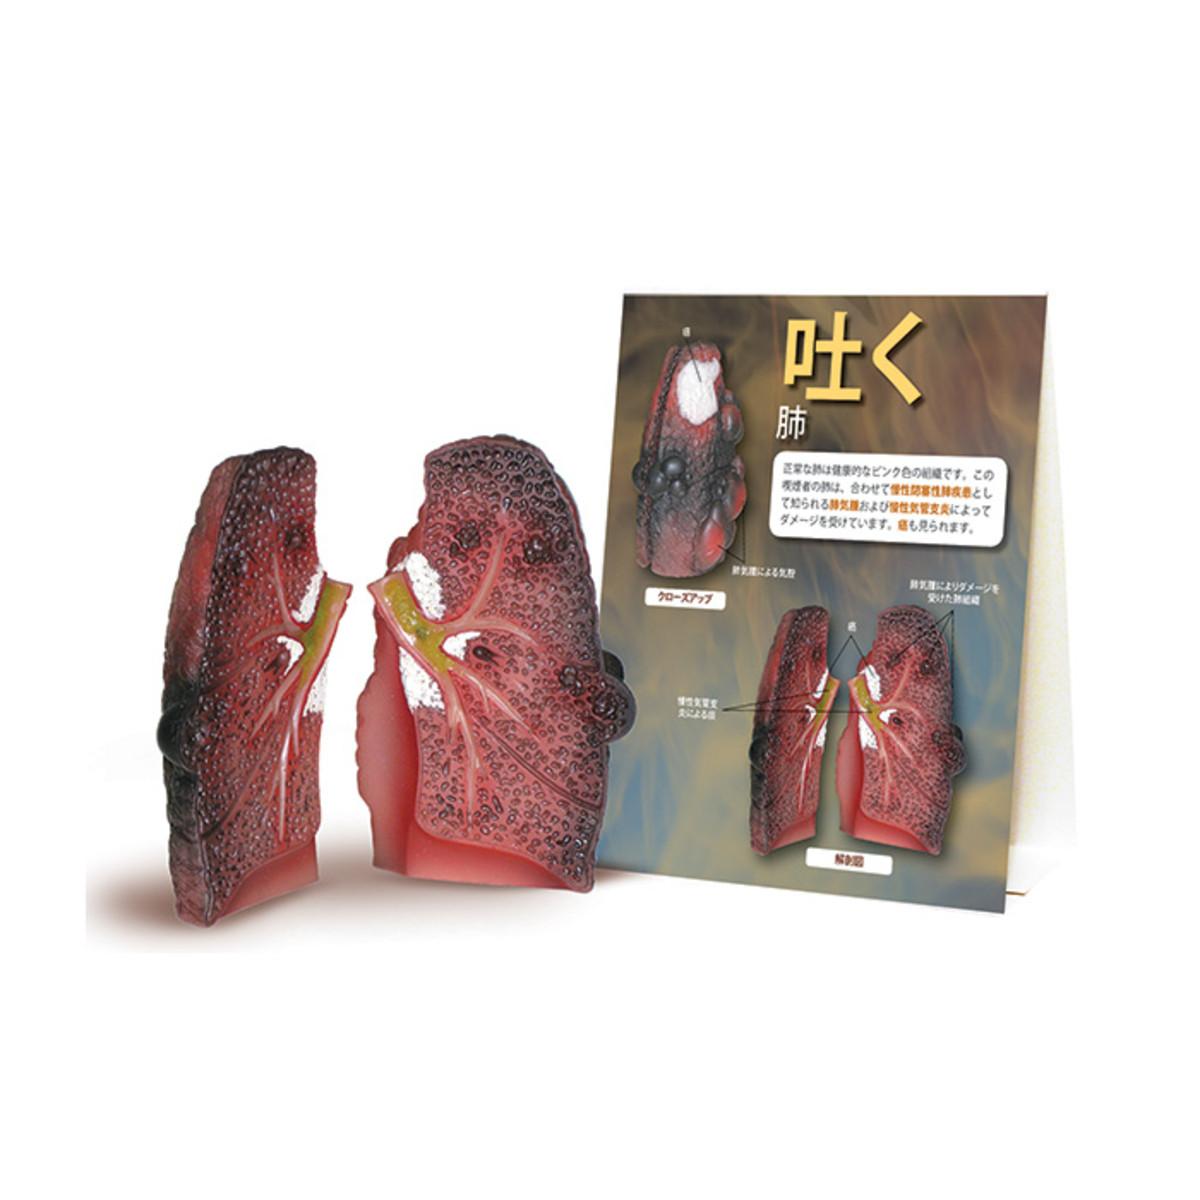 Health Edco; Japanese; health education products; tobacco; cancer; smoking cessation; pulmonary disease; chronic; lung damage